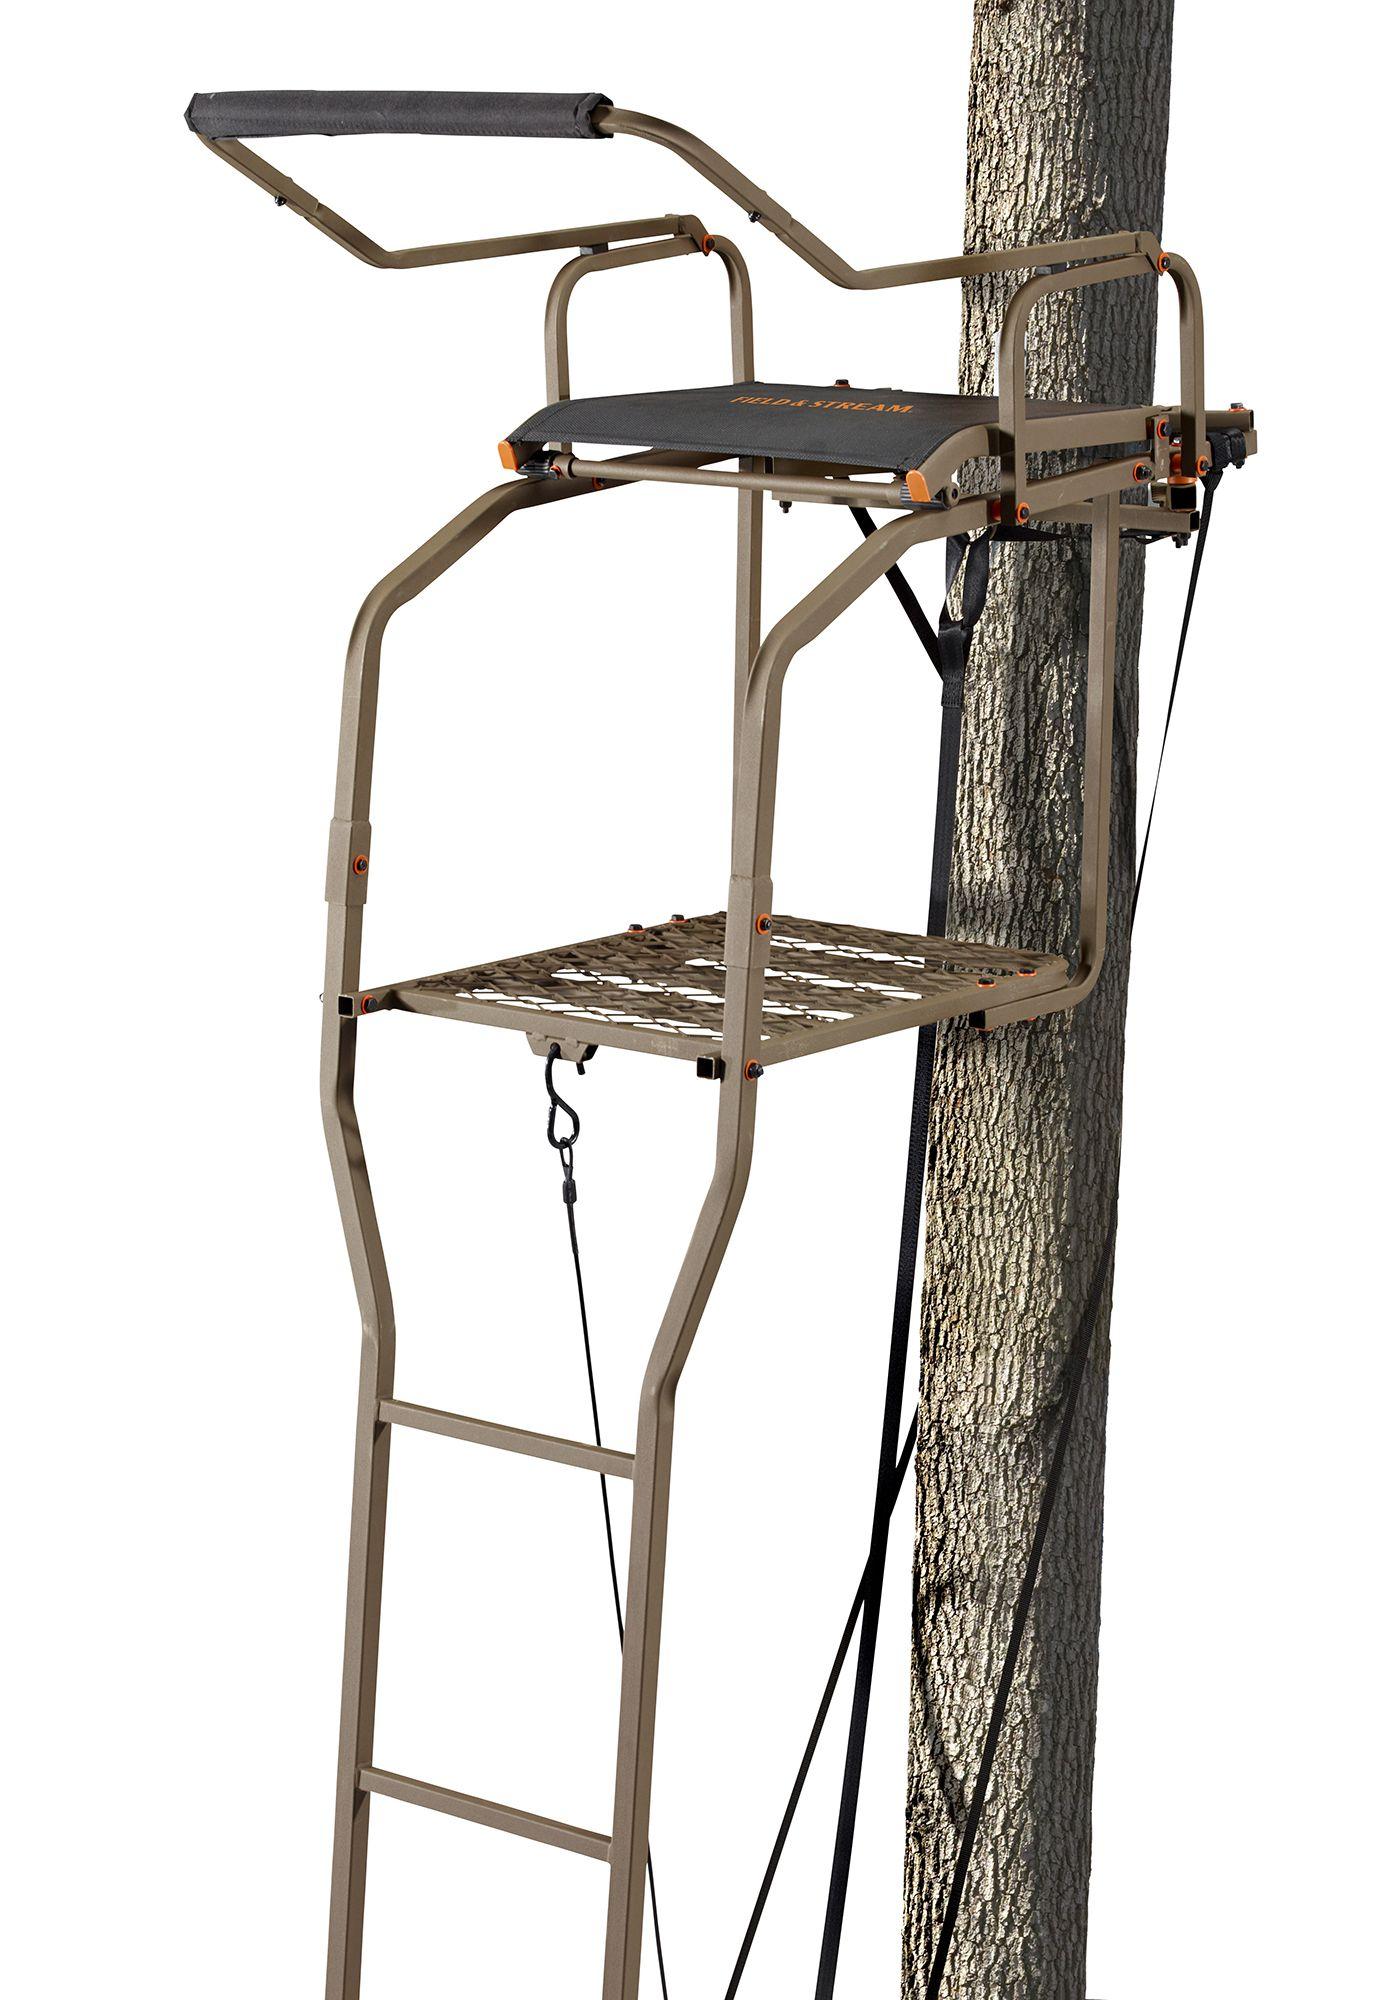 Field & Stream Lookout Deluxe Ladder Treestand